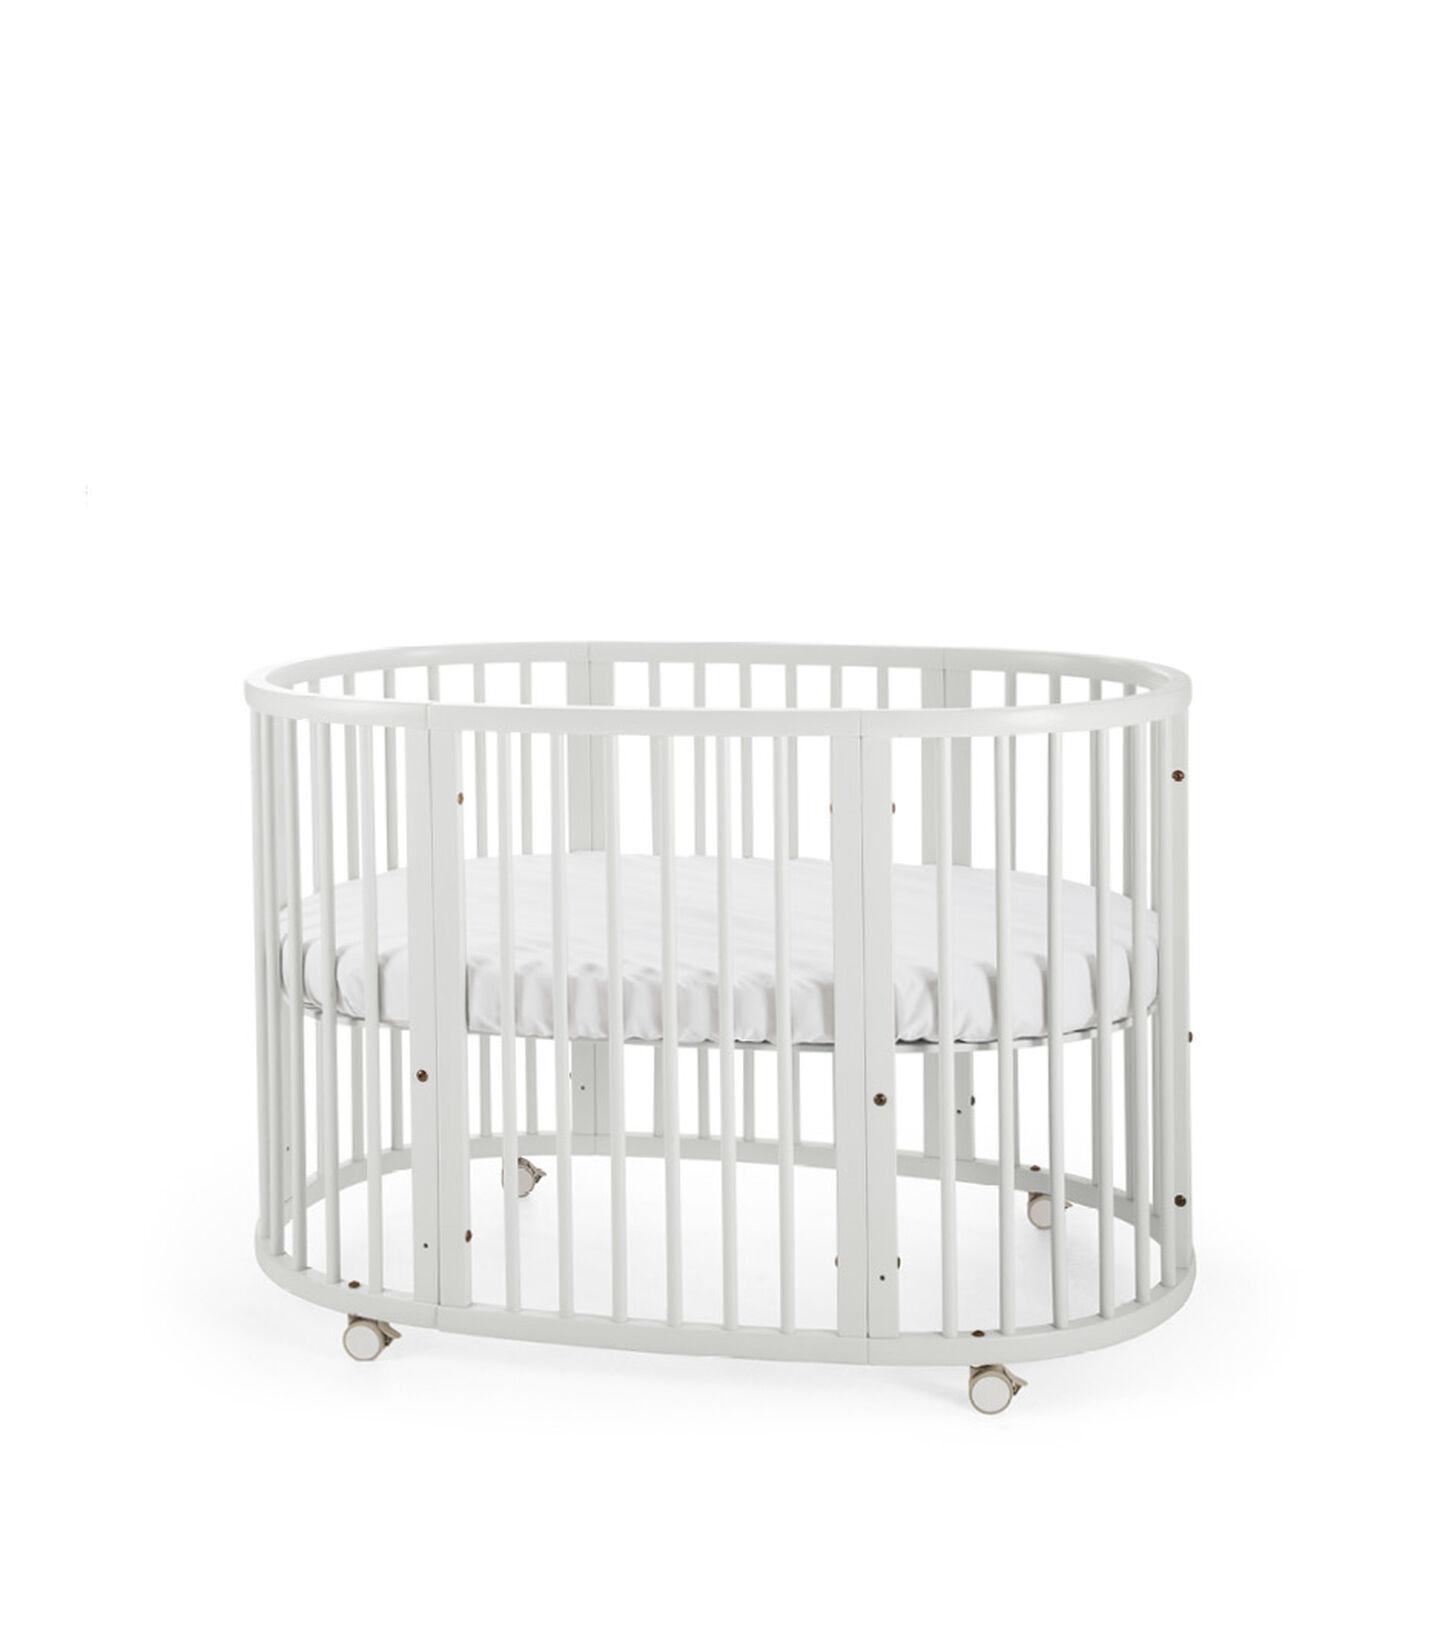 Stokke® Sleepi™ Bed. White. Mattress high. view 2